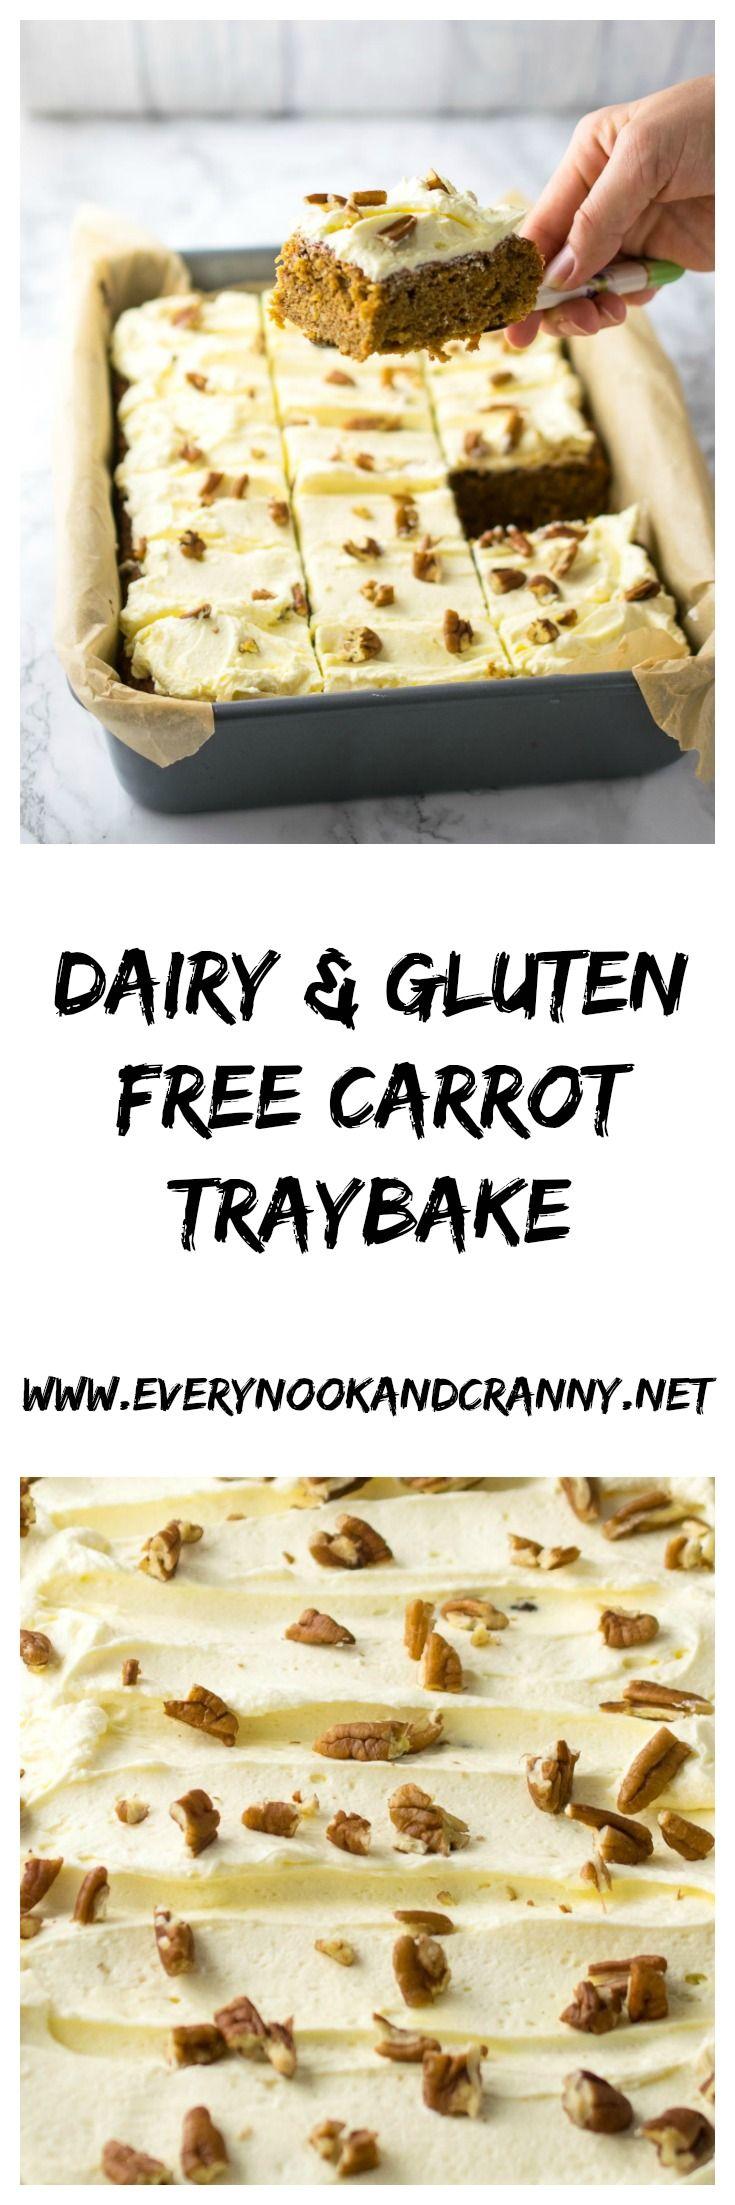 Dairy & Gluten Free Carrot Traybake - Every Nook & Cranny